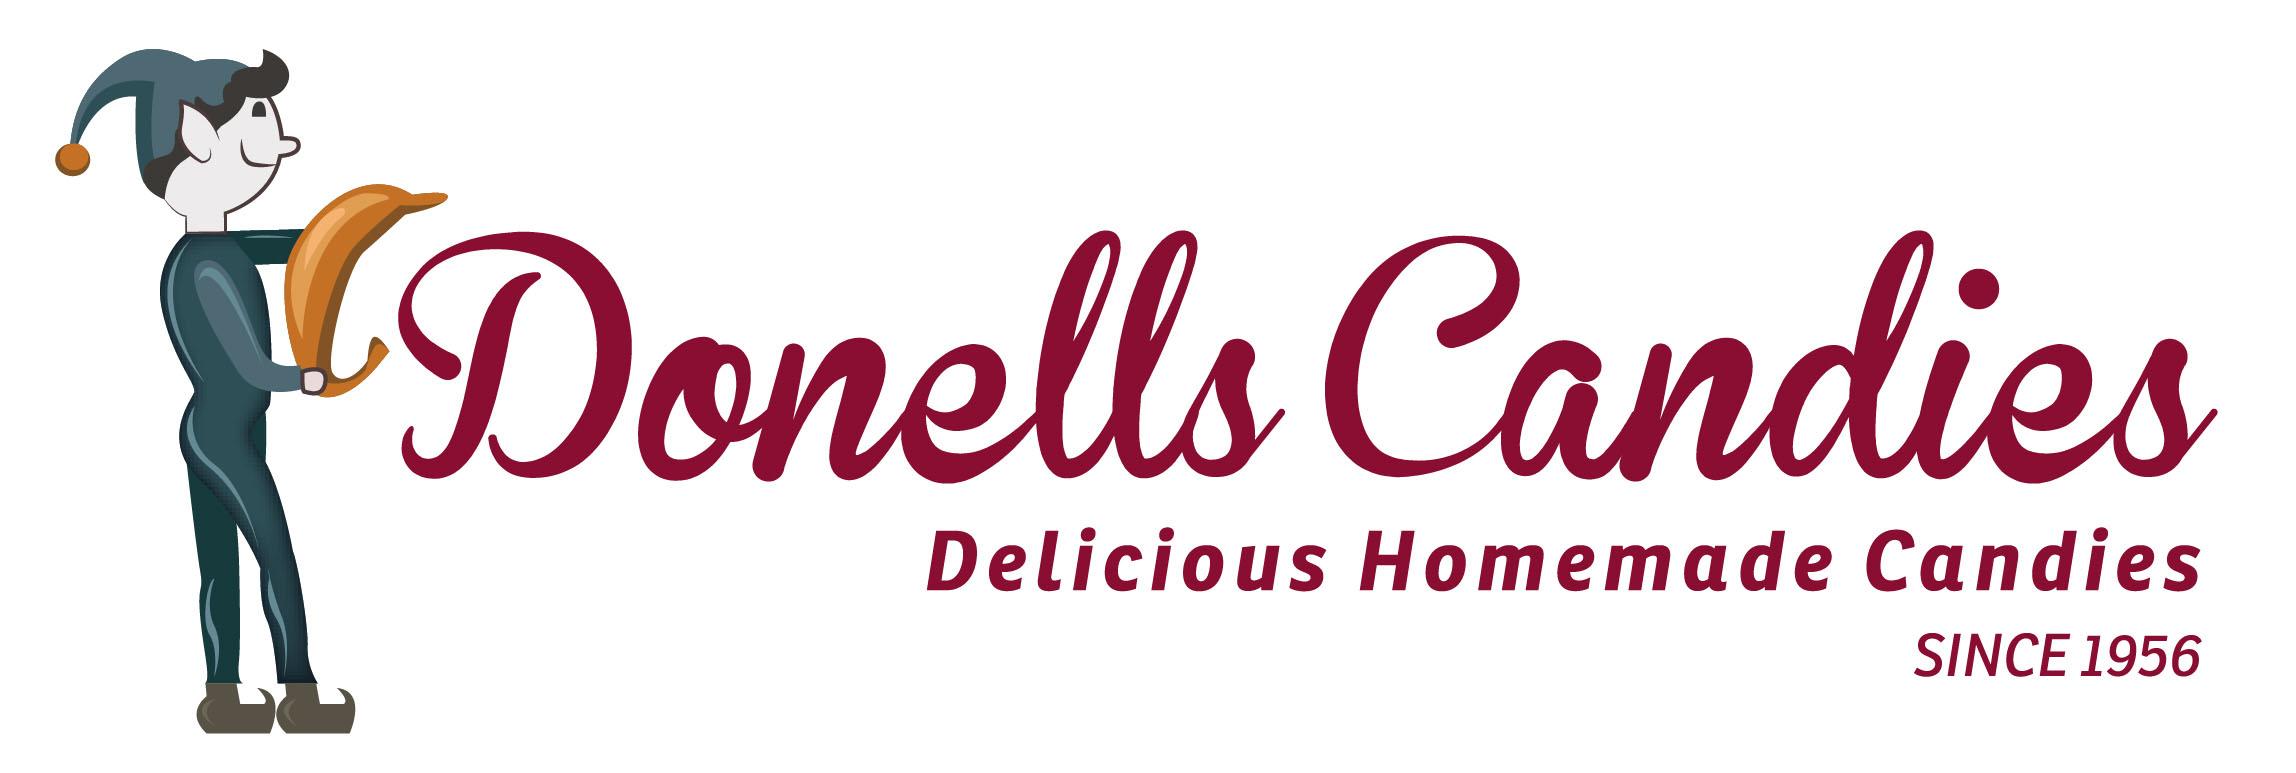 Donells Candies logo